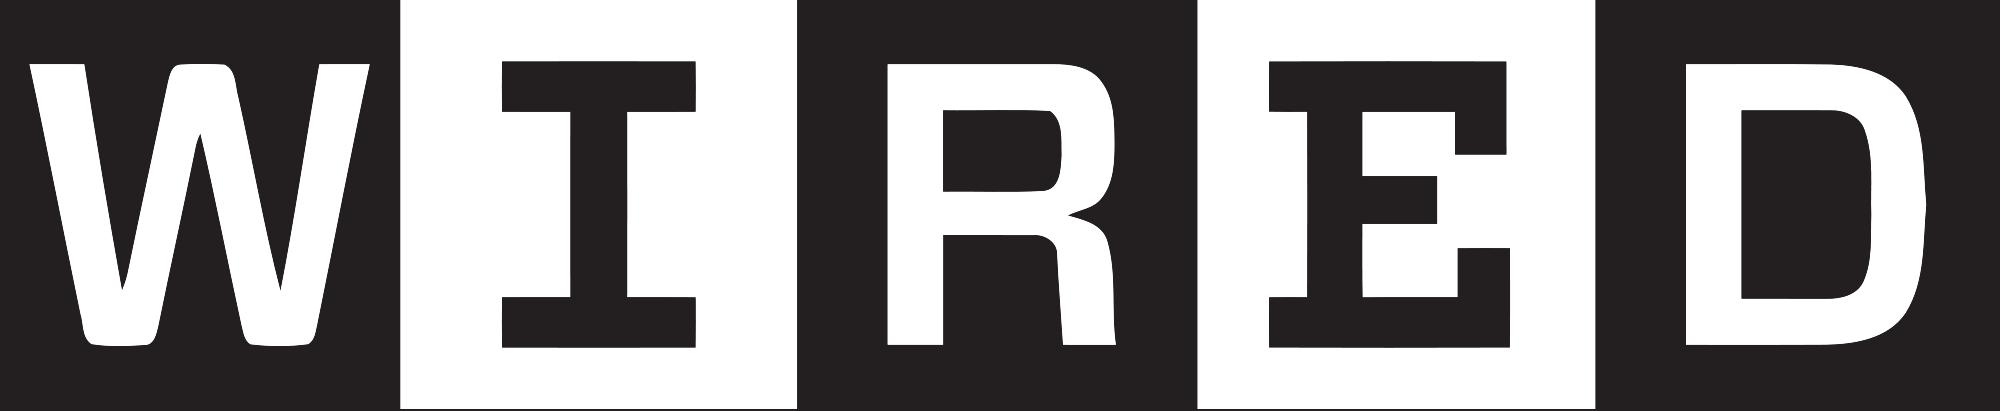 Логотип издания Wired